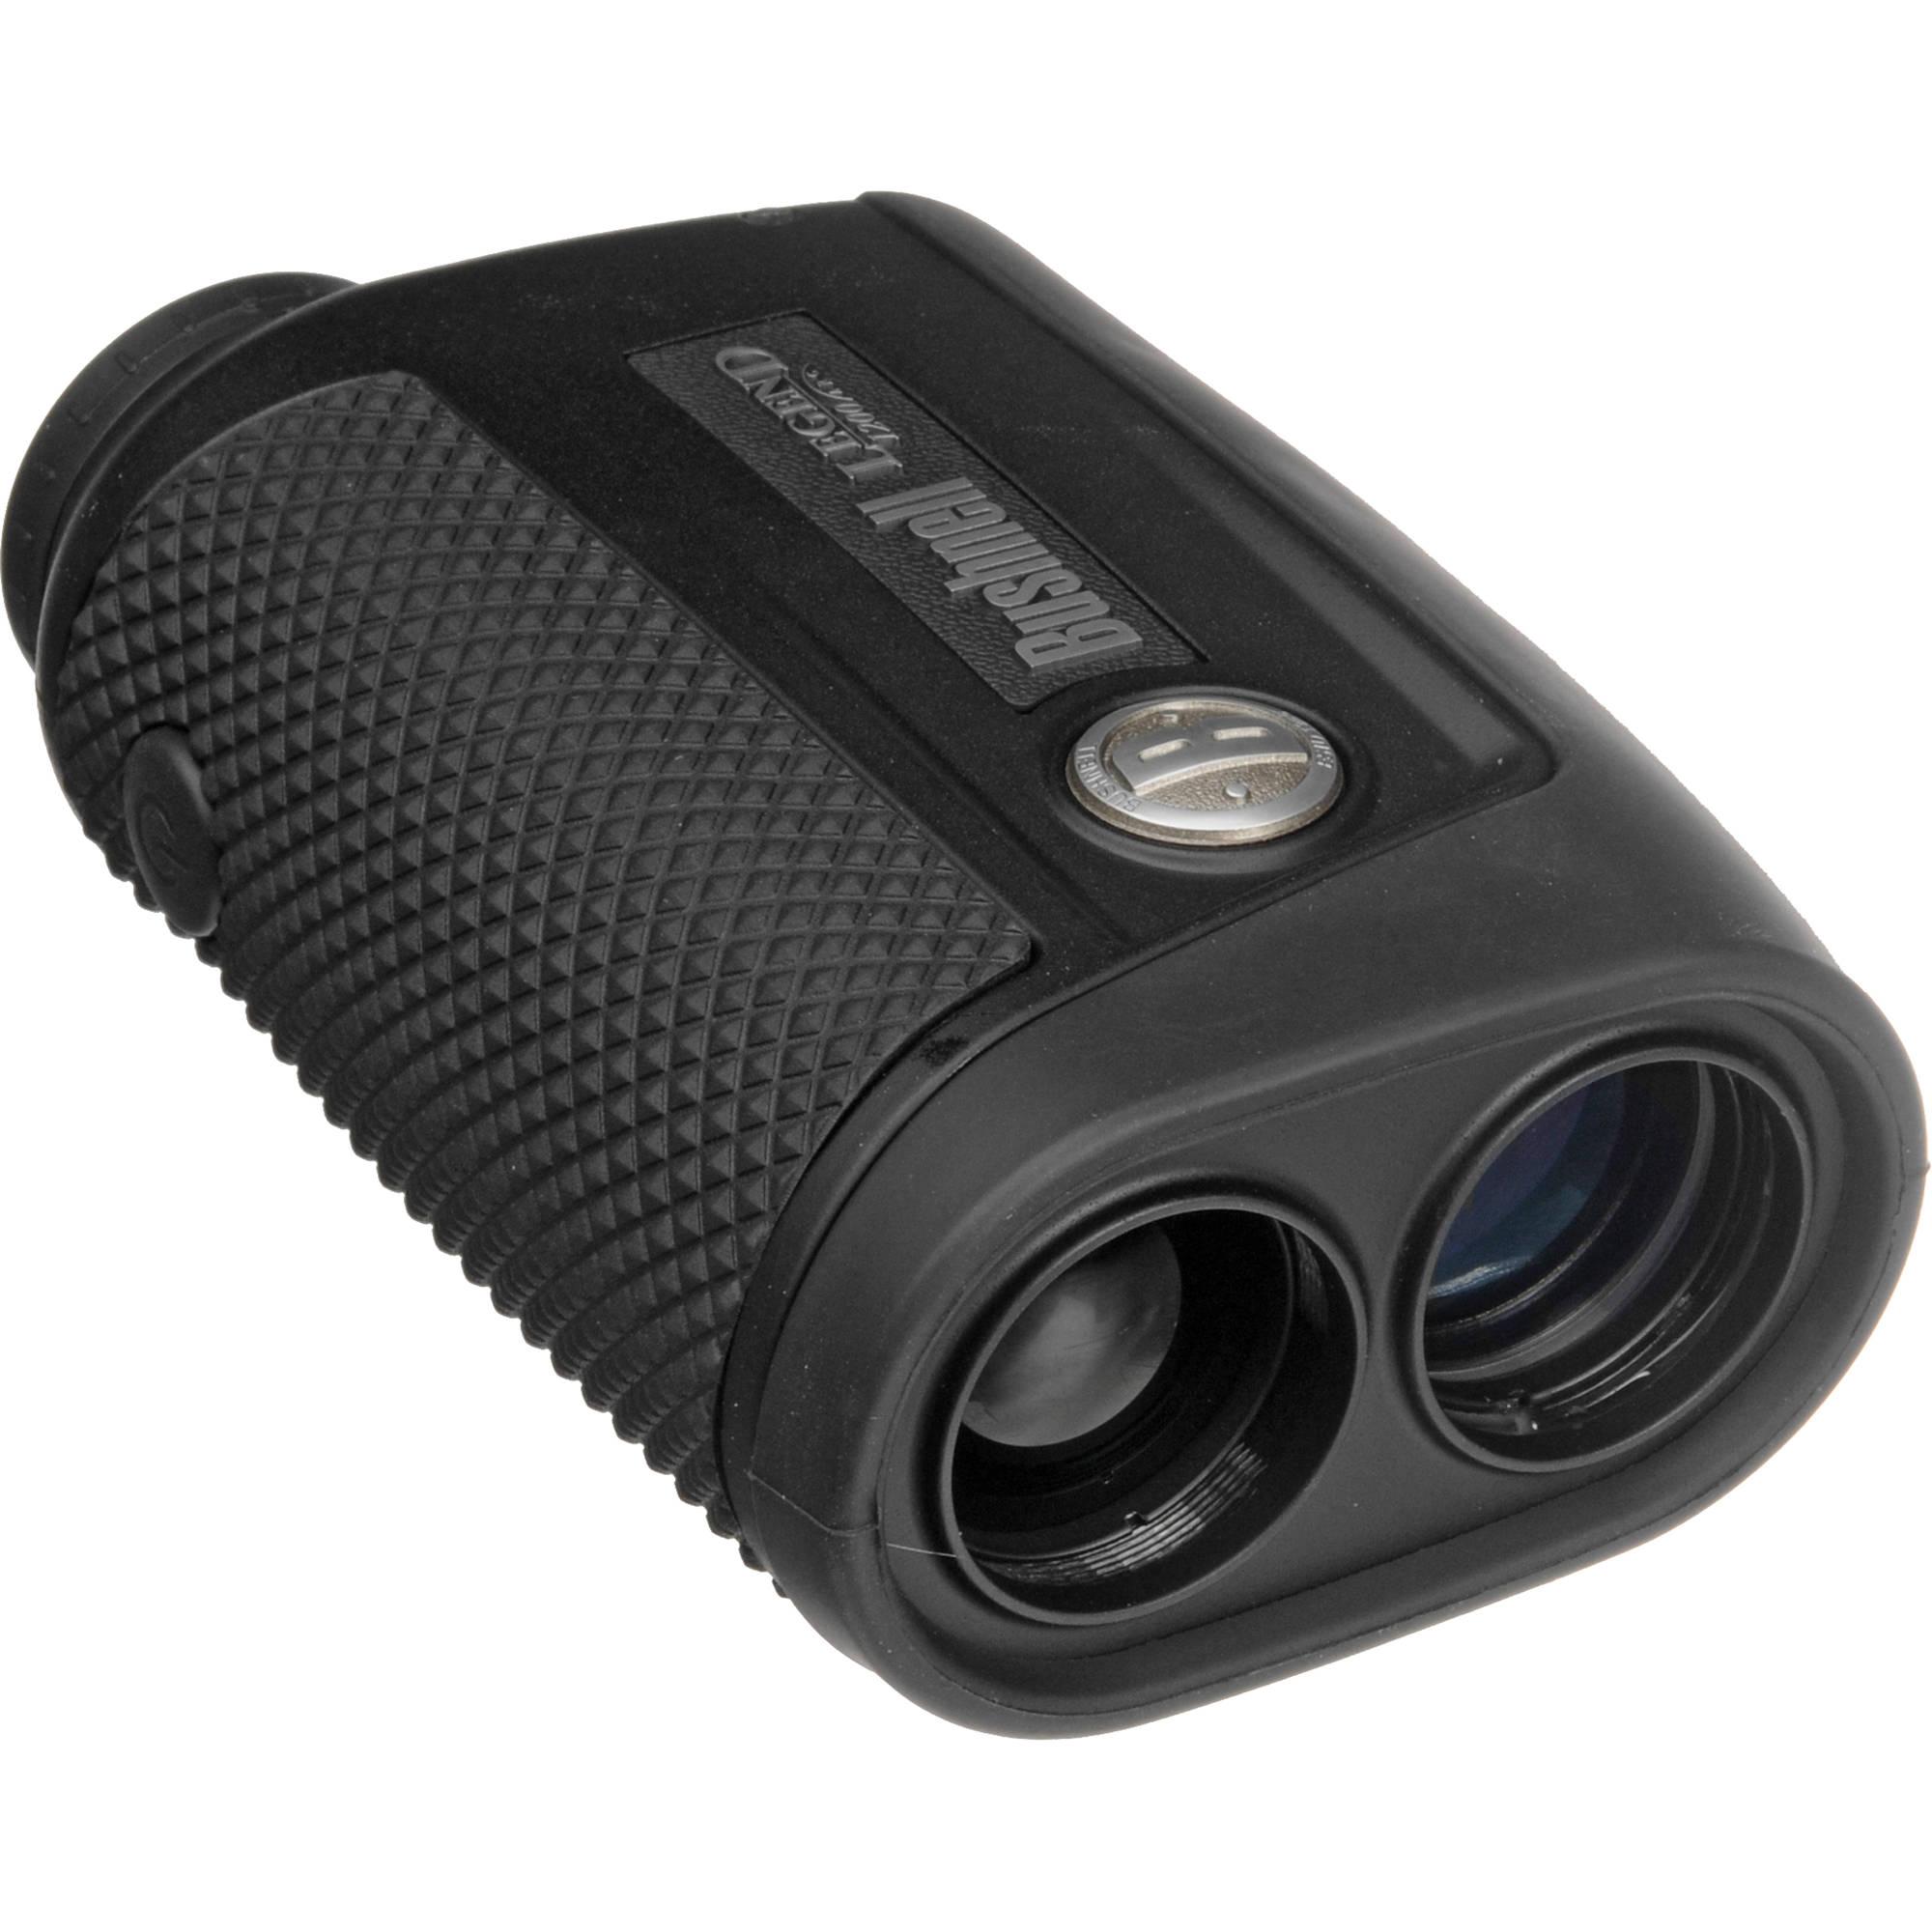 Bushnell team primes the truth arc bow mode laser rangefinder, 4 x.